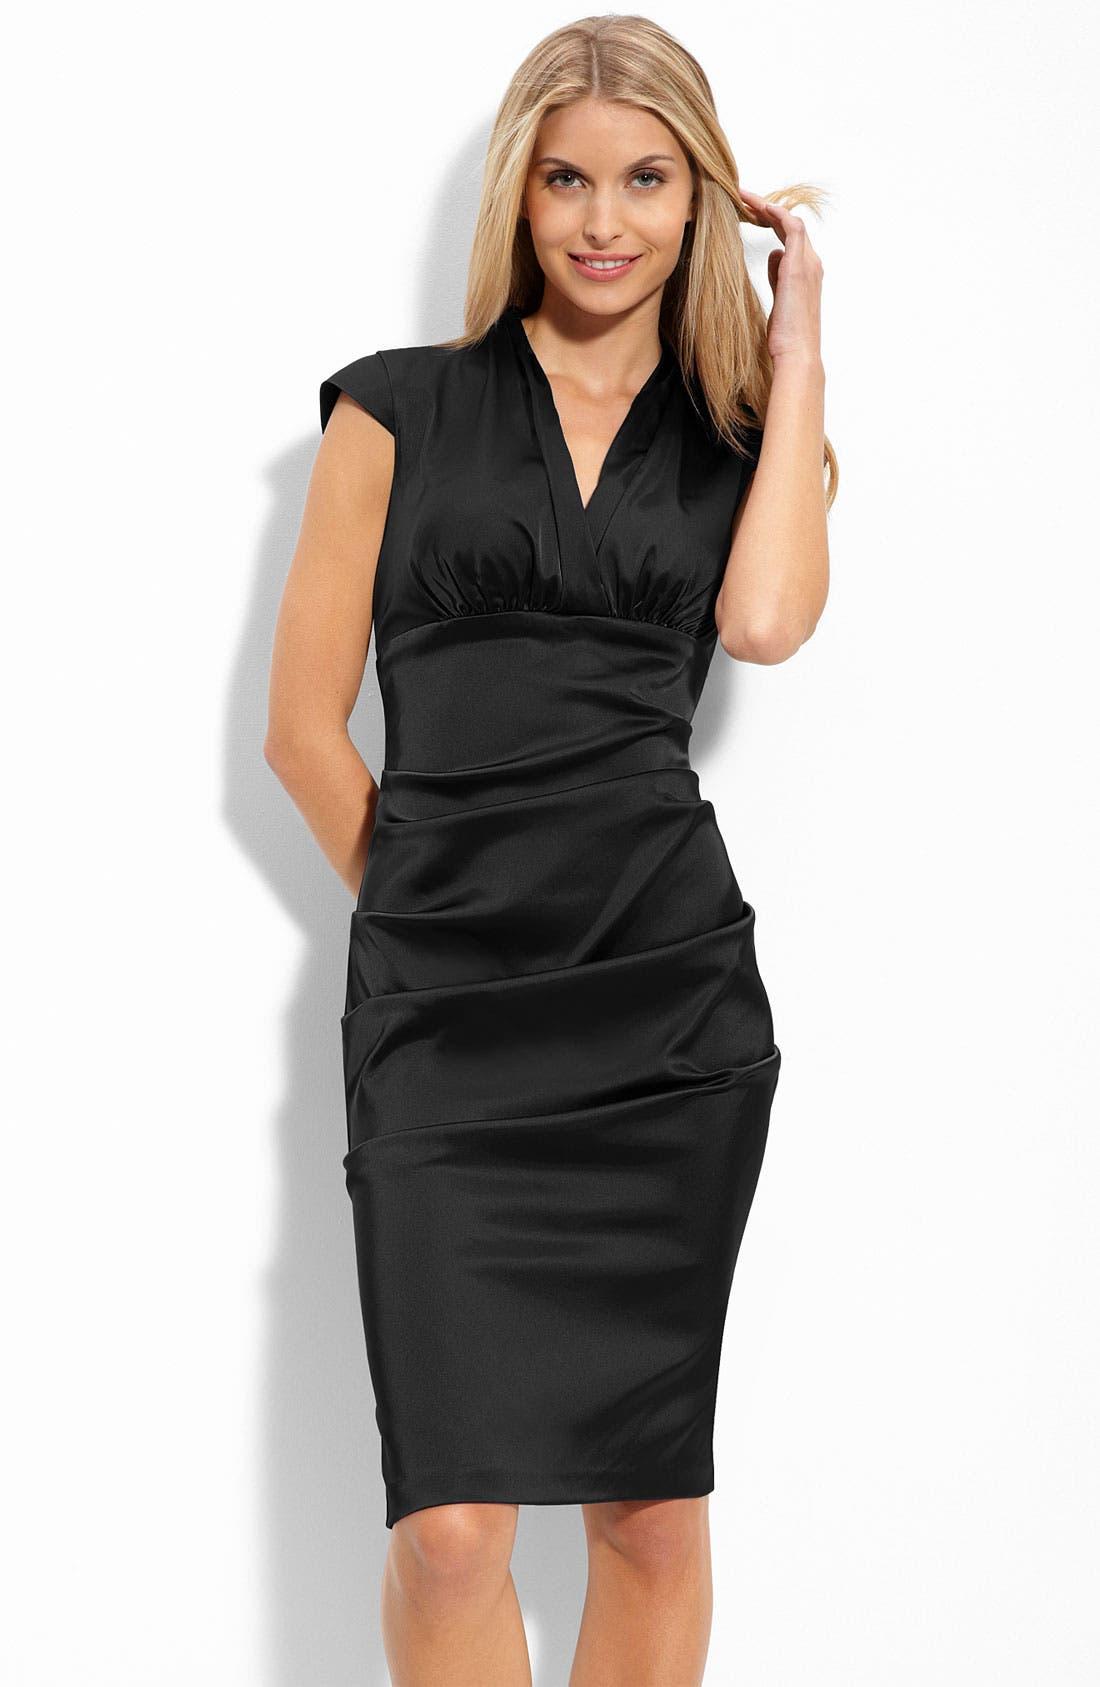 Alternate Image 1 Selected - Xscape Pleated Stretch Satin Sheath Dress